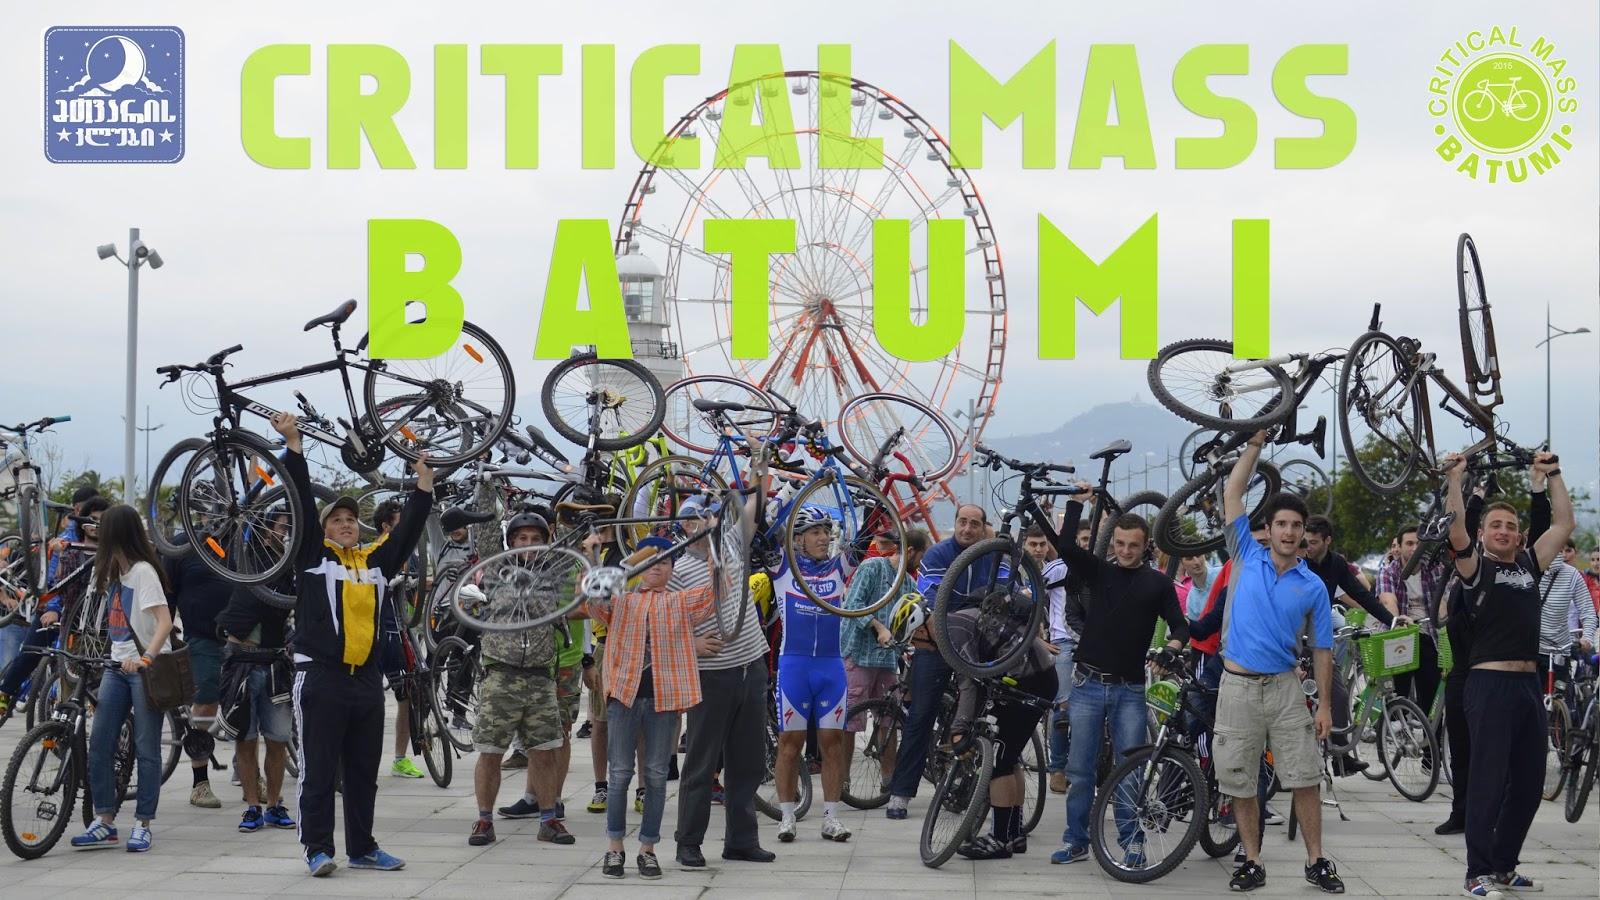 Critical Mass Batumi 29.05.2015 კრიტიკული მასა N 2